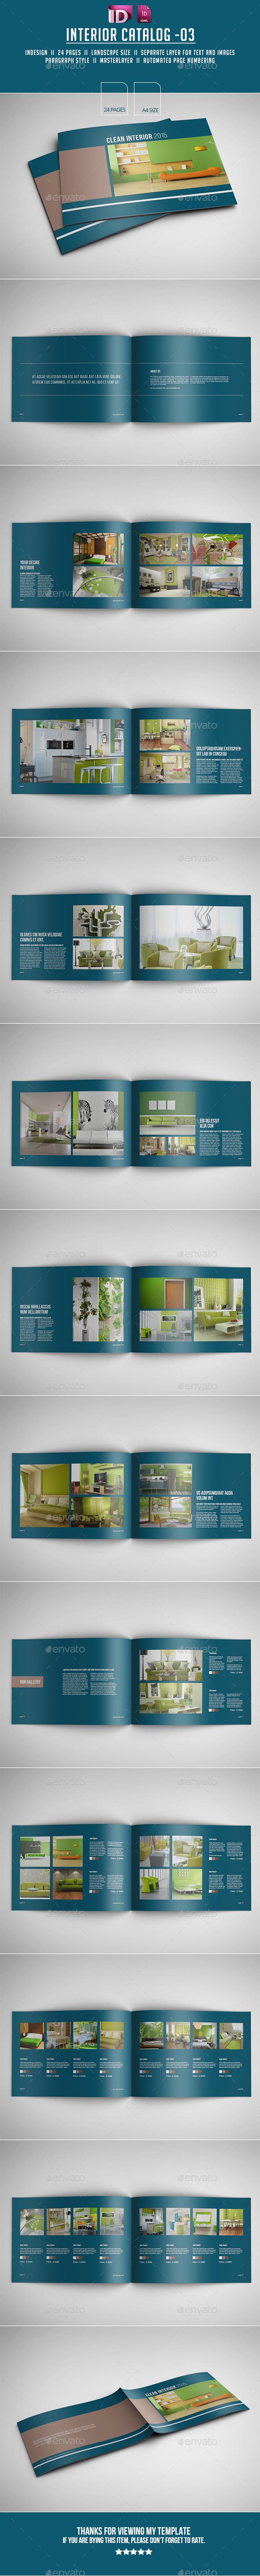 Catalog - Catalogs Brochures